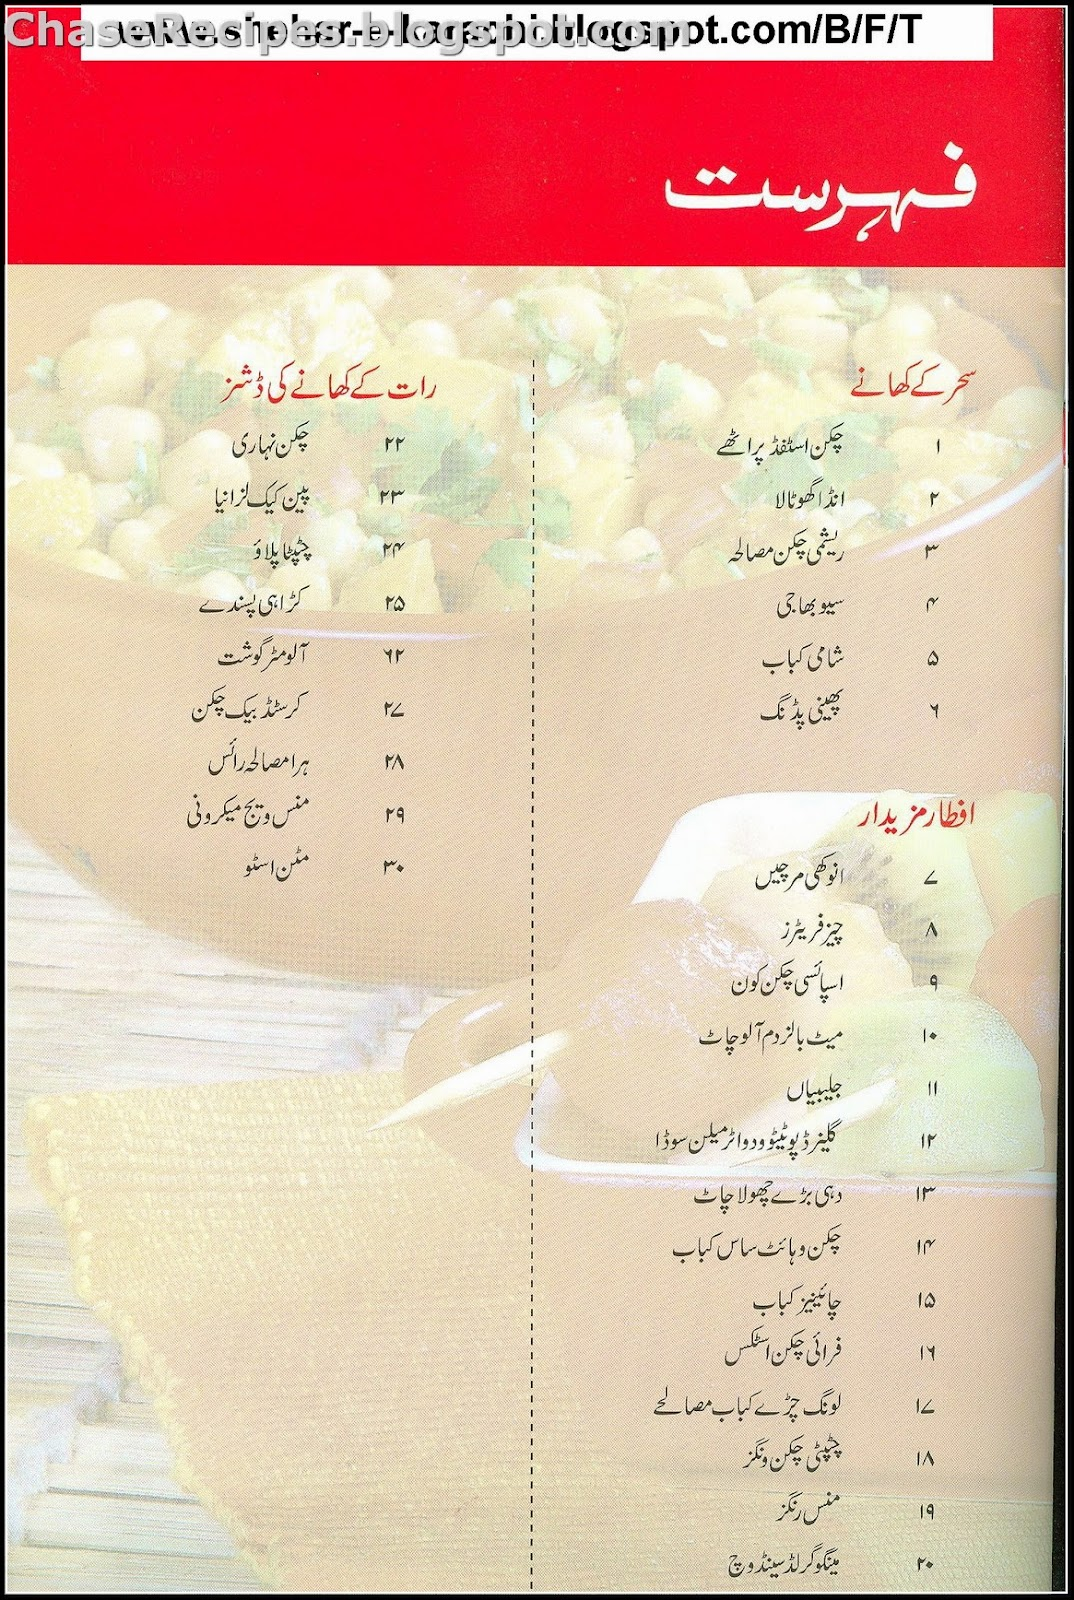 List of Ramzan Recipes (Iftari Sehri) - Chase Recipes